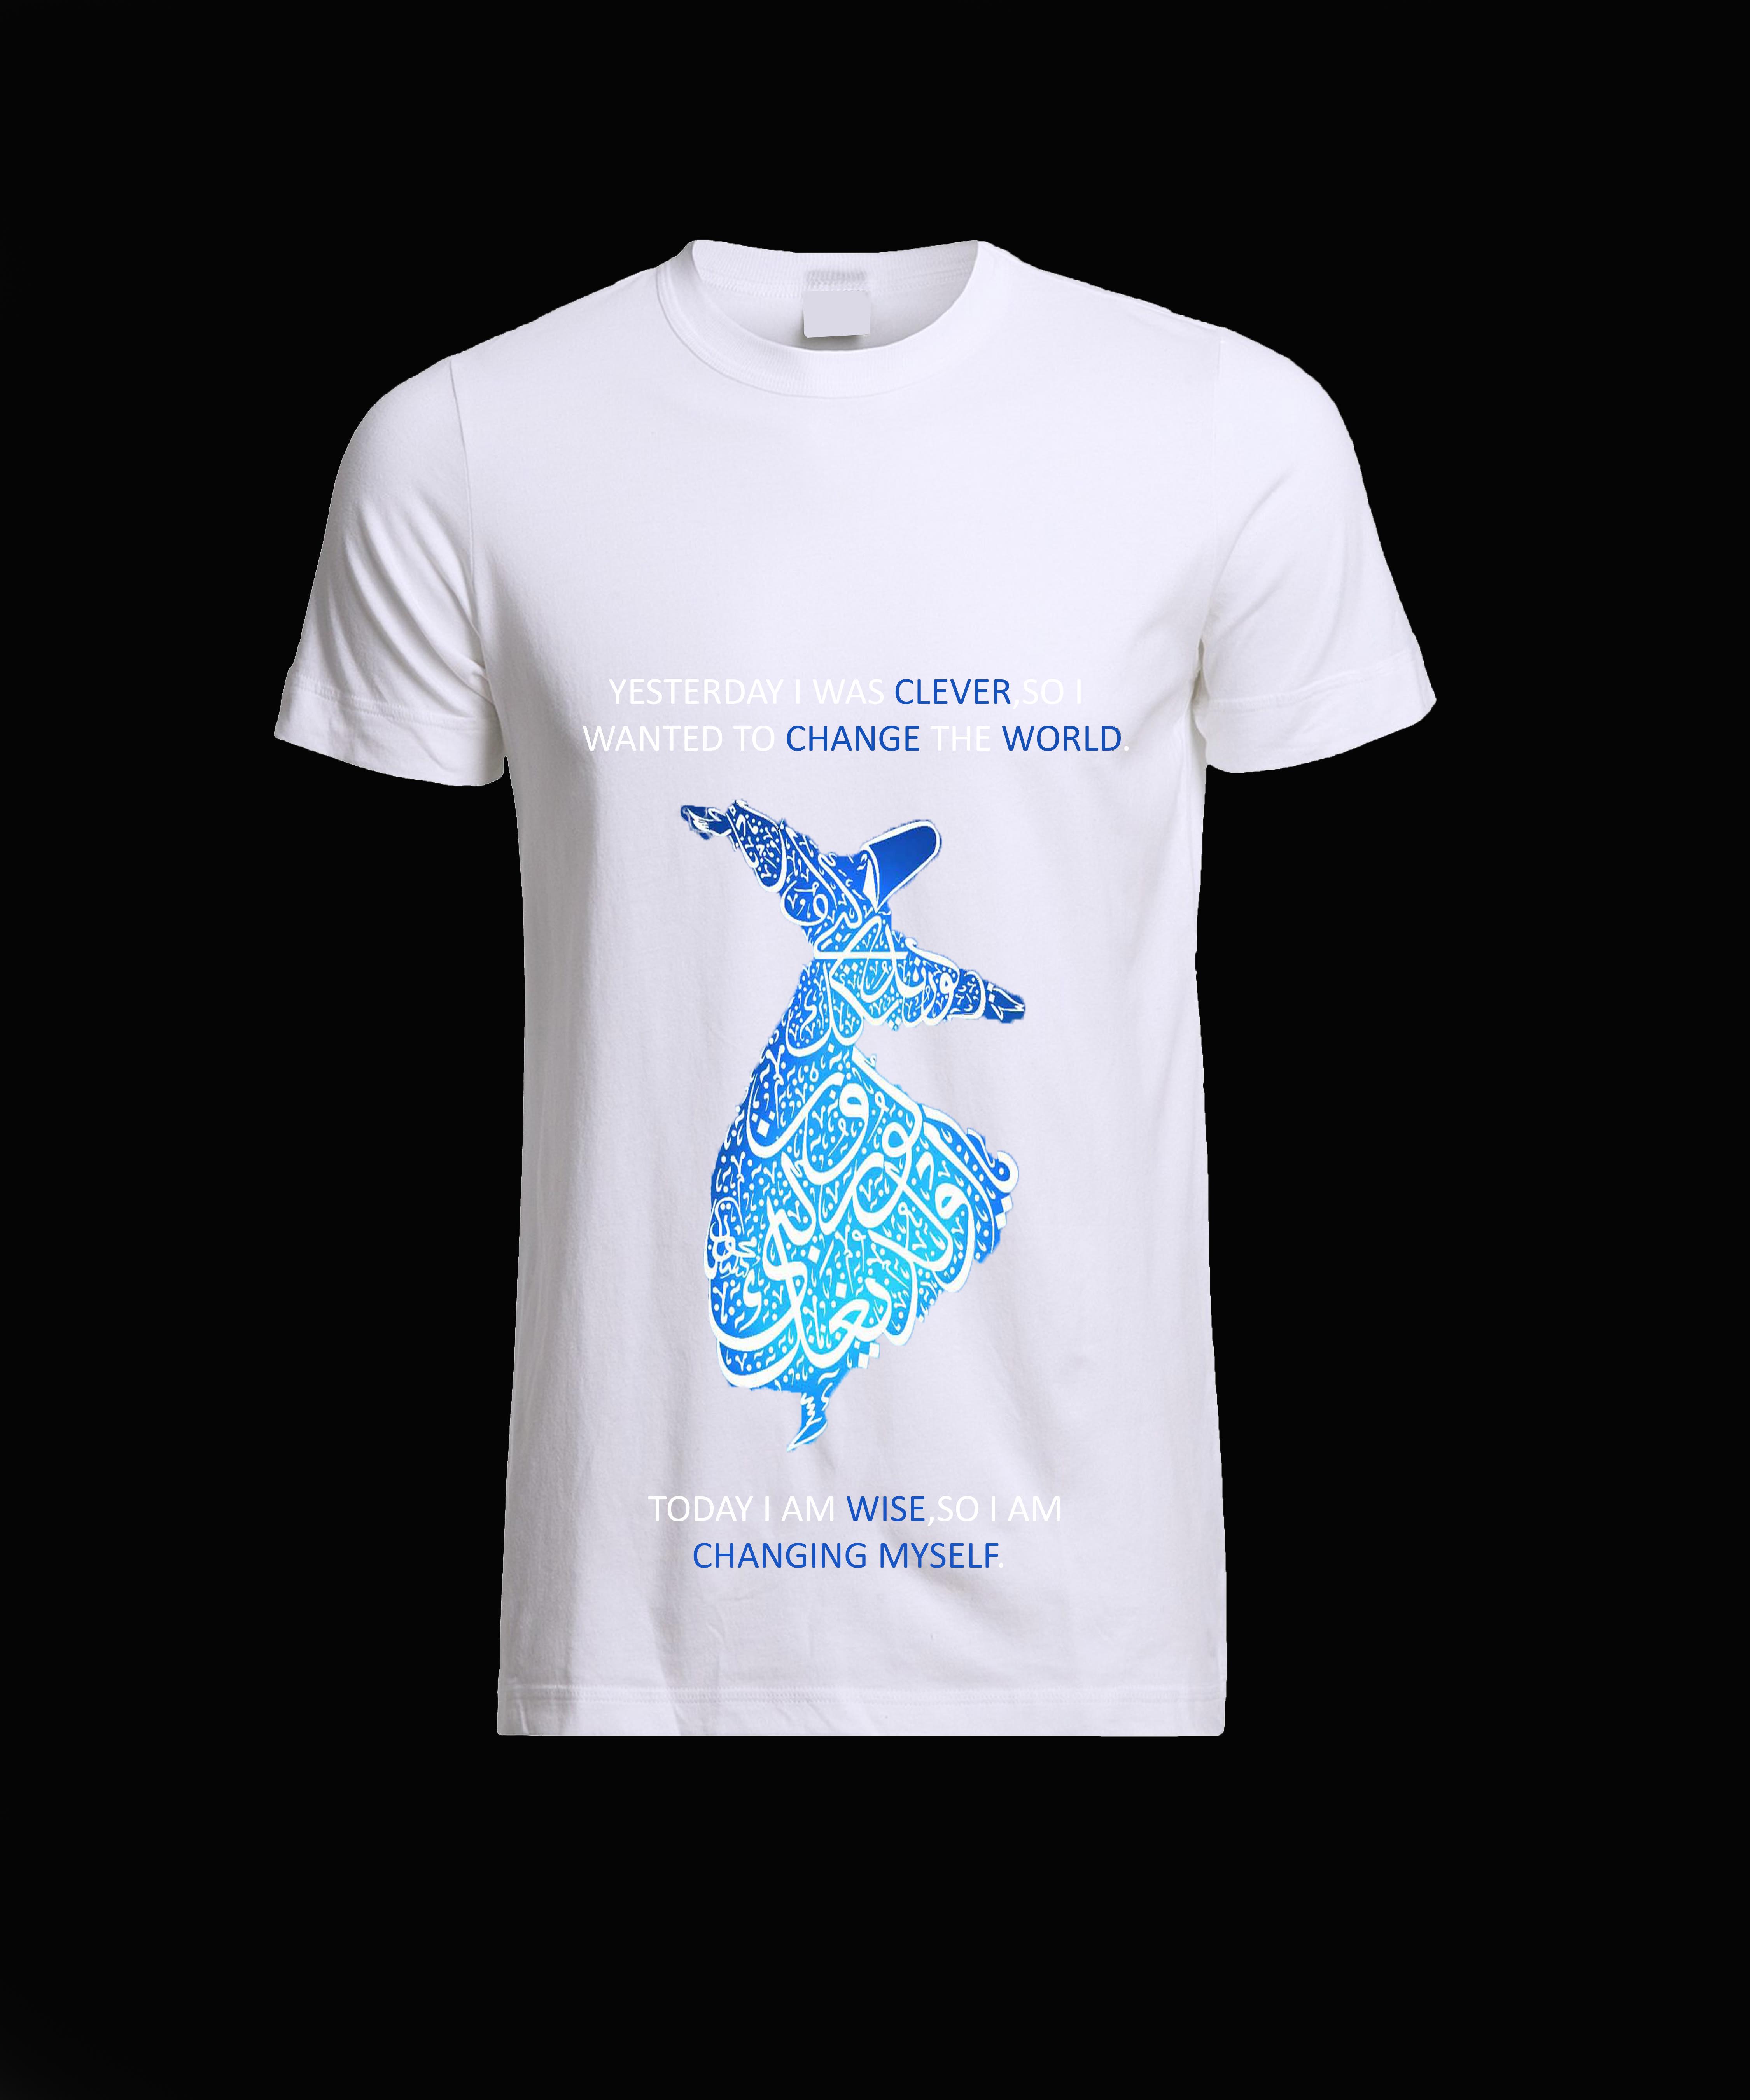 Do Creative T Shirt Designs By Abbygrace